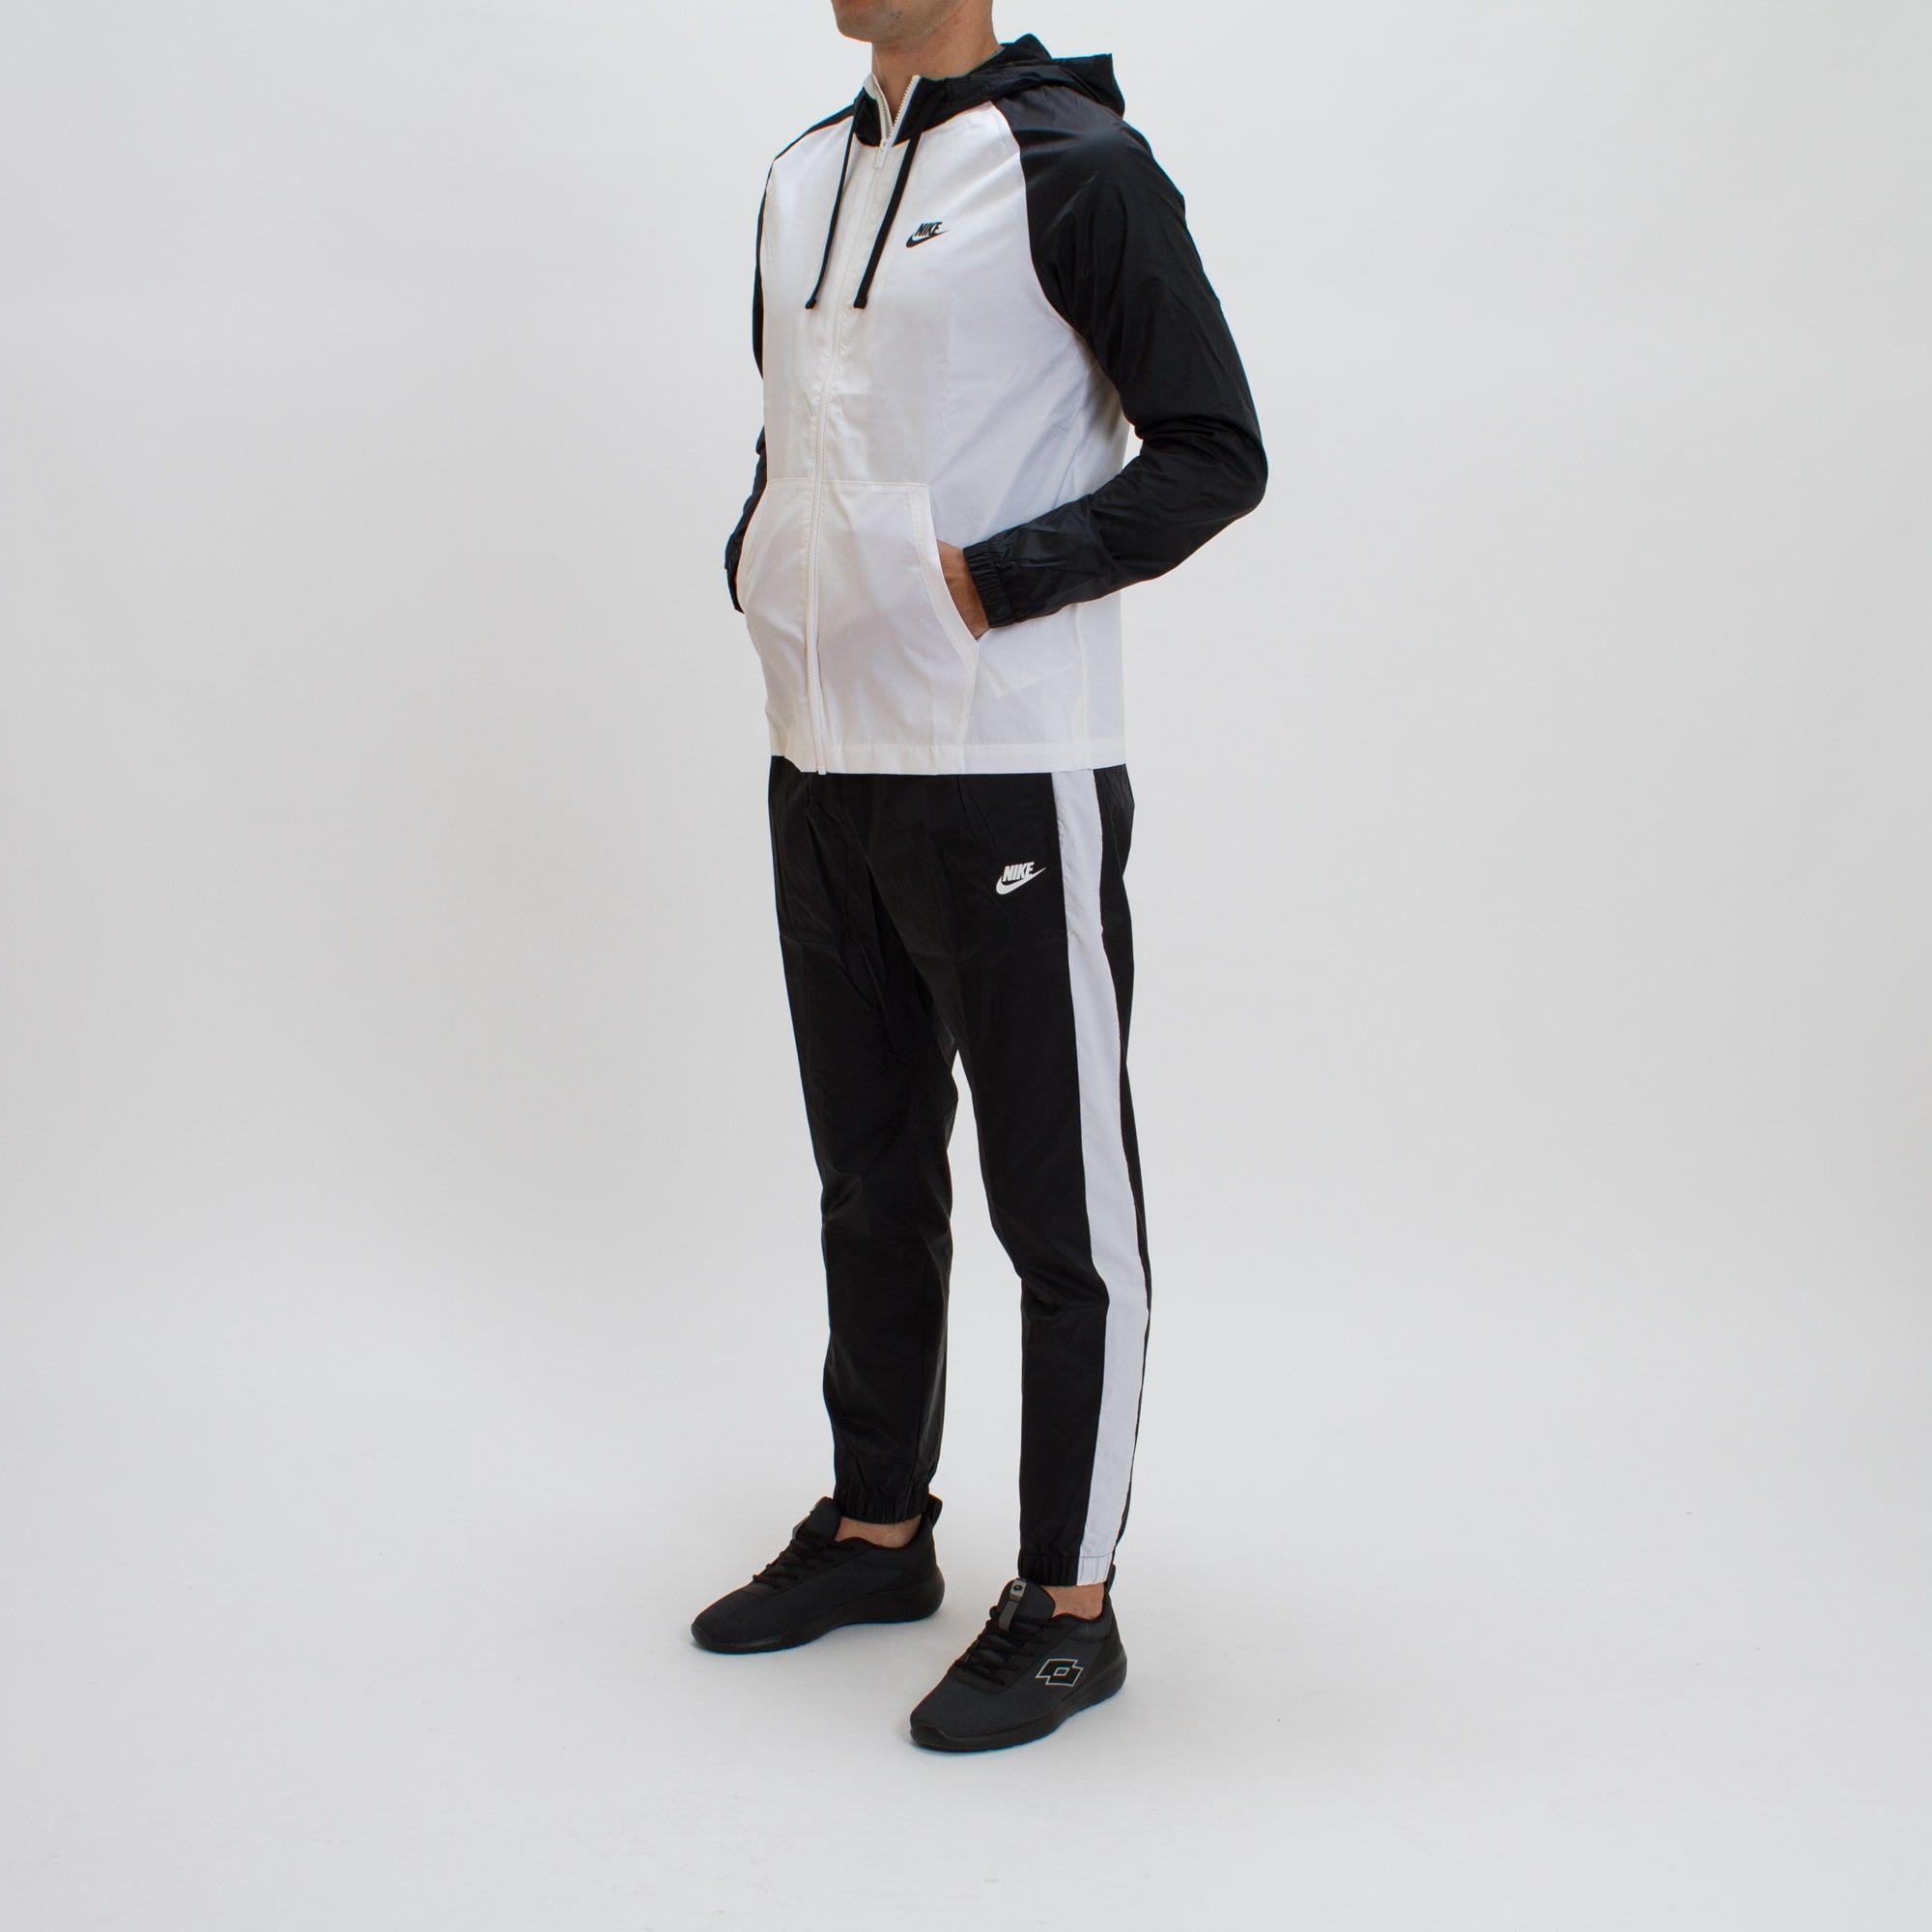 Pagar tributo Artesano Marcha mala  Nike Herren M NSW Ce TRK Suit Hd WVN Tracksuit sidra.hospital